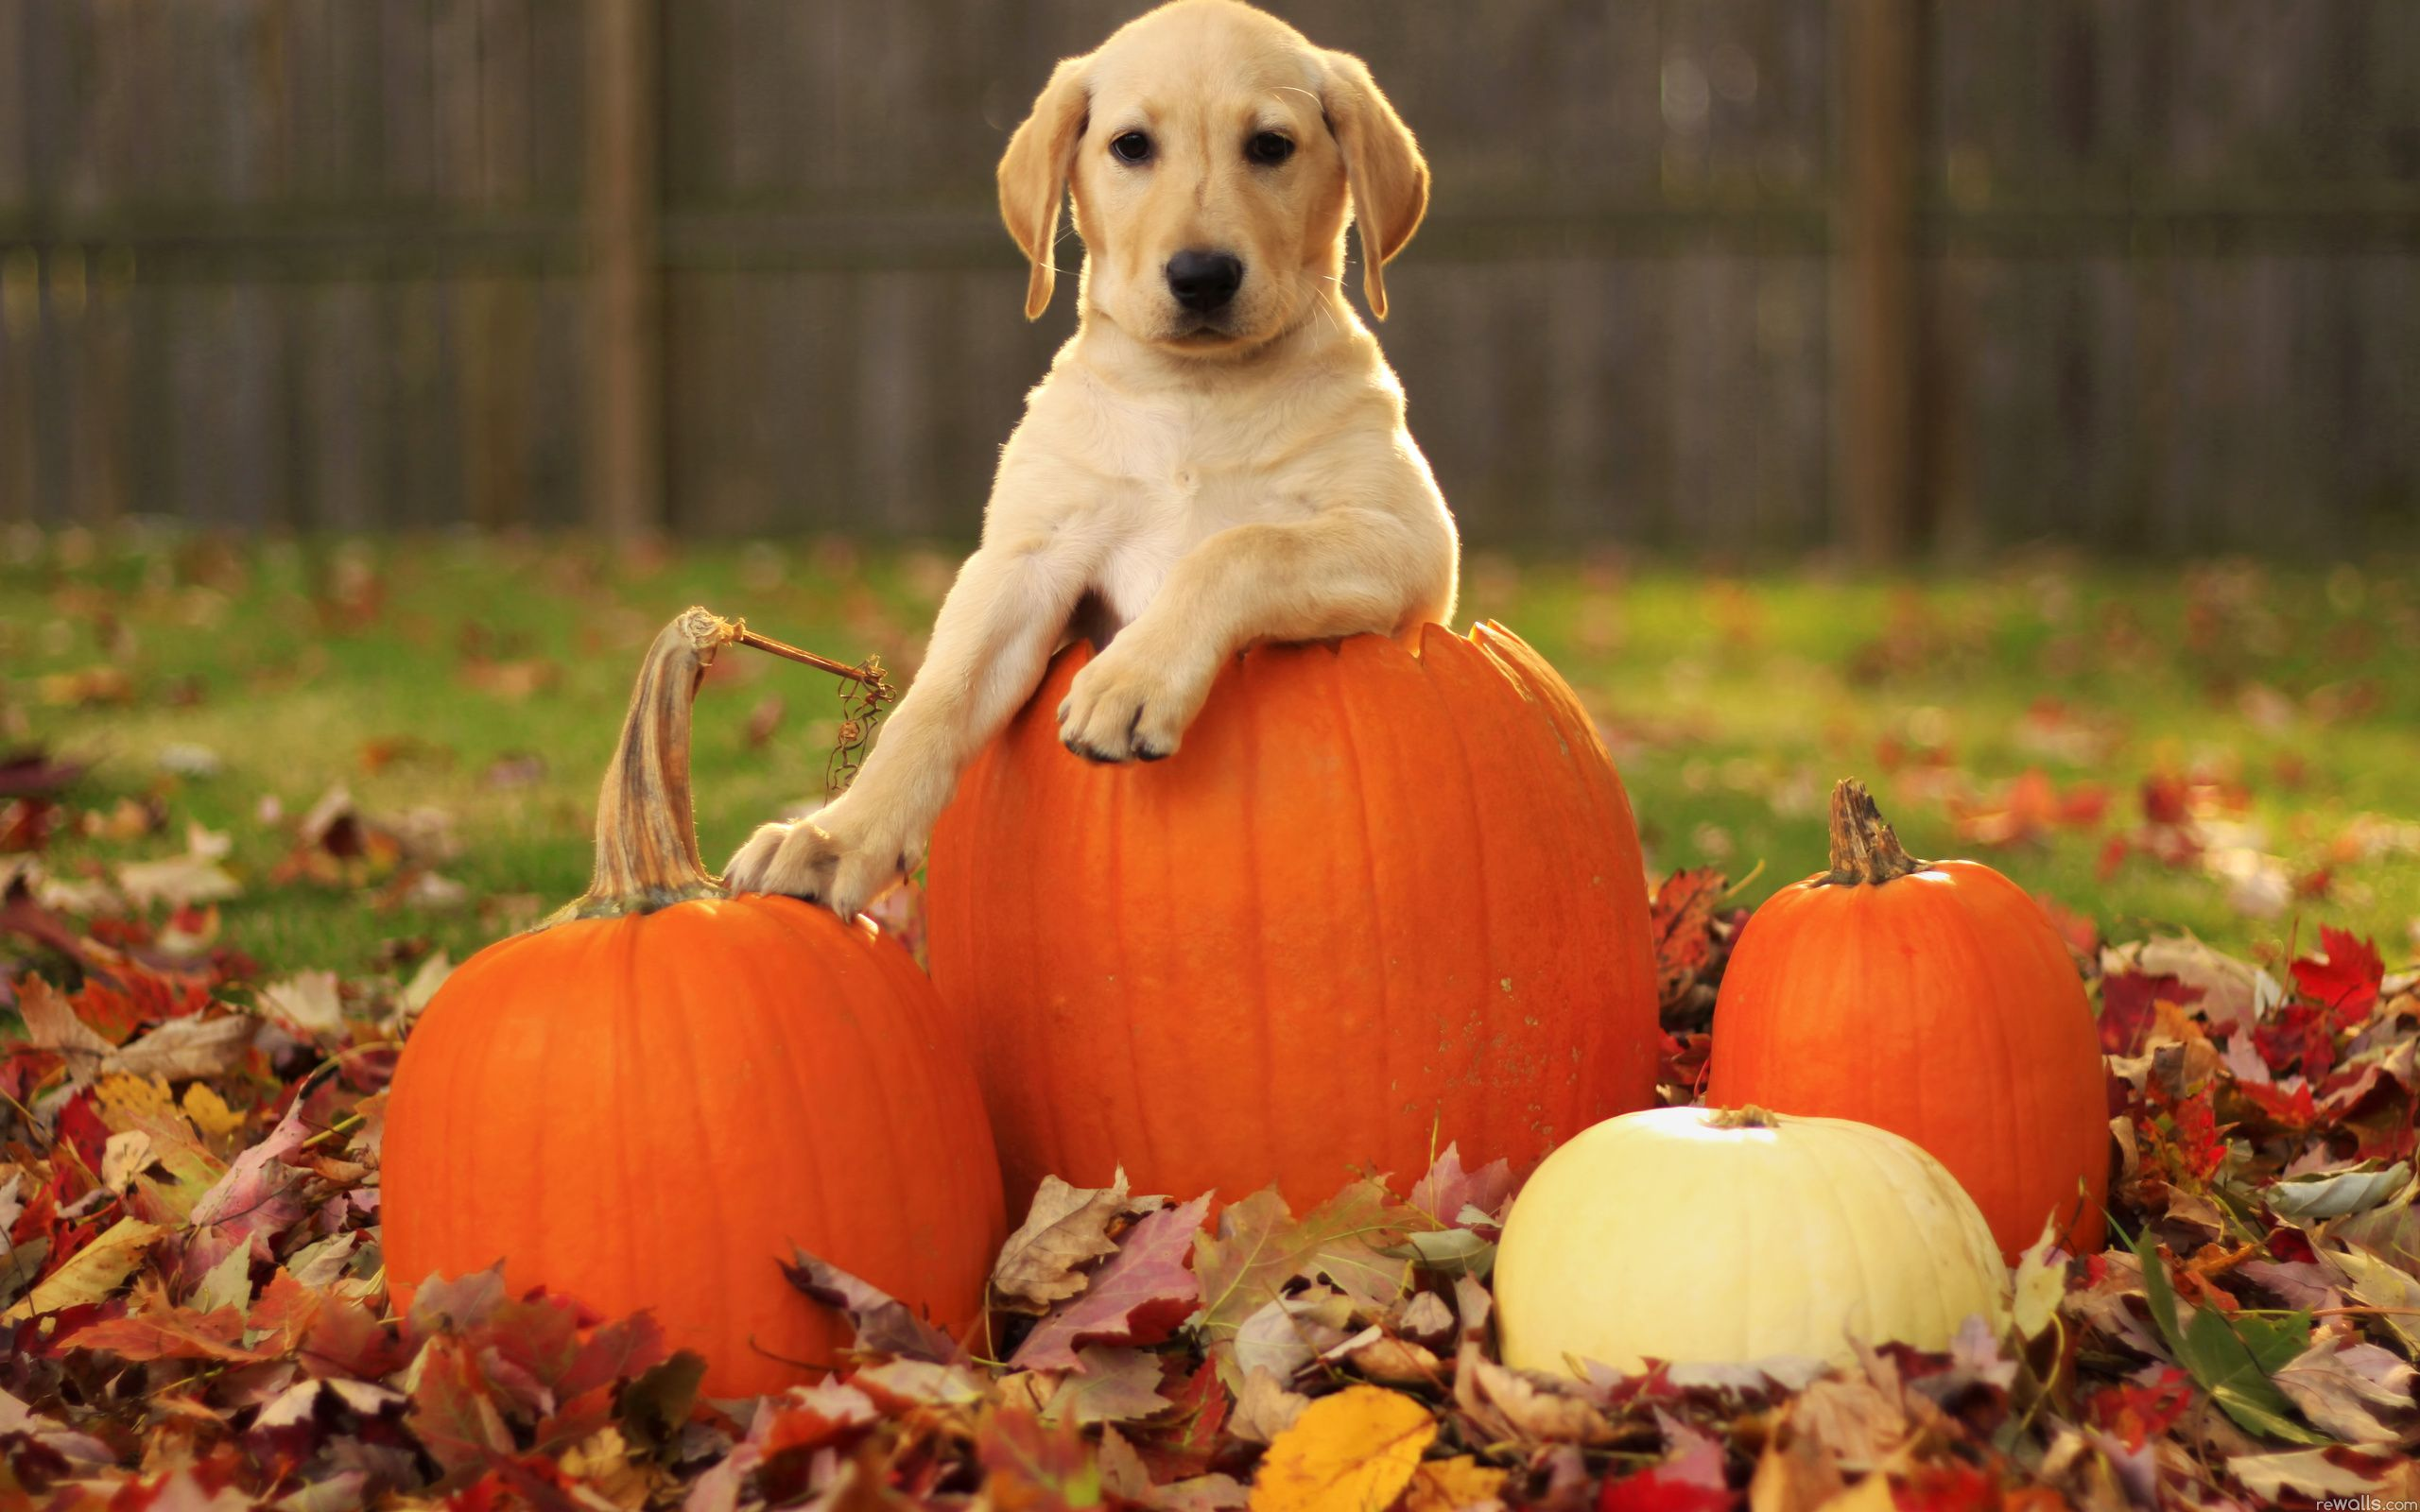 Autumn Halloween Wallpapers Free Download Google Search Labrador Retriever Dog Love Labrador